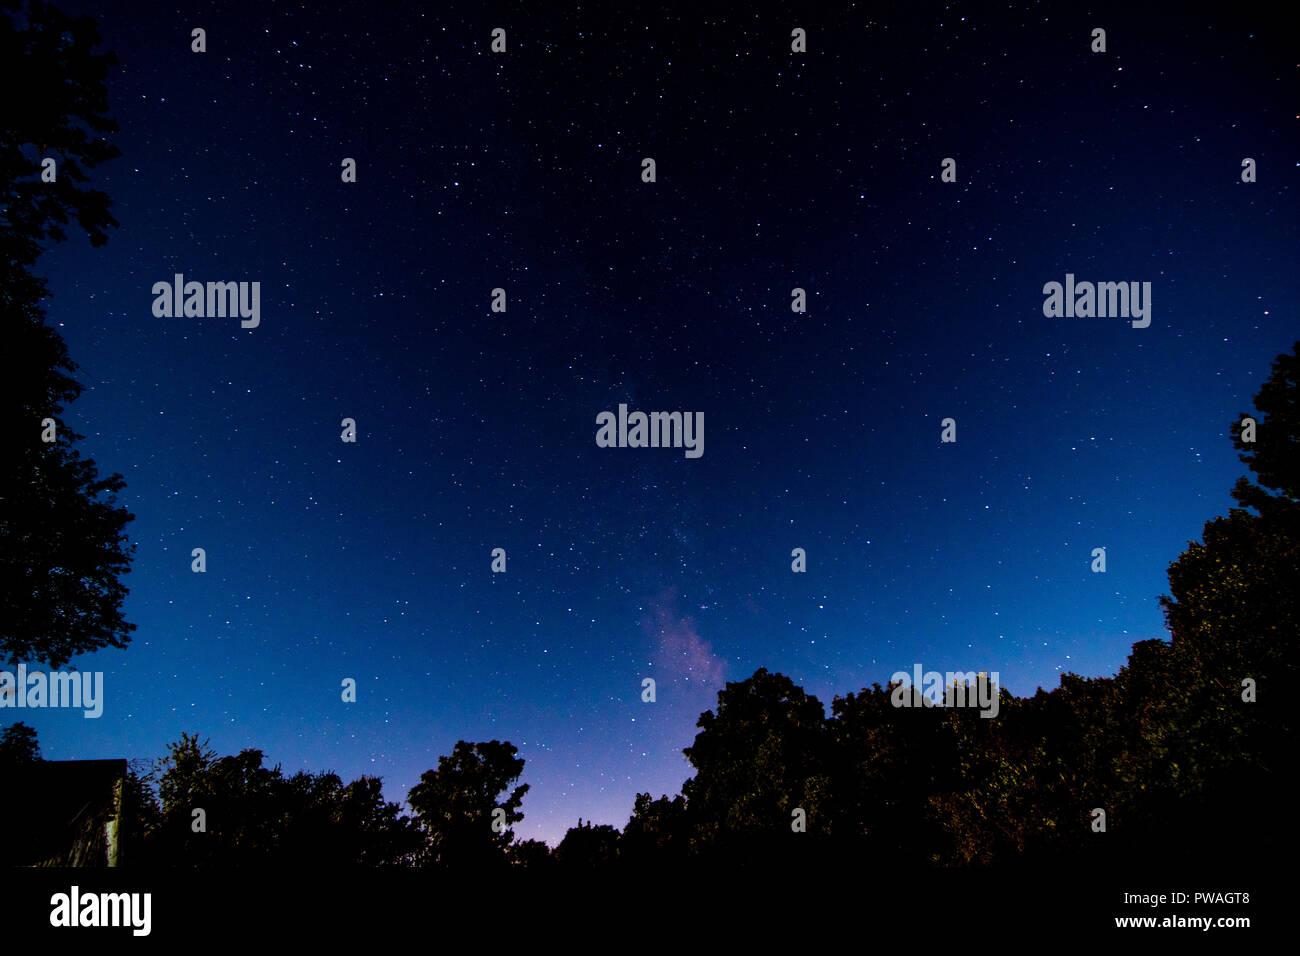 Galaxy Wallpaper Photos Galaxy Wallpaper Images Alamy